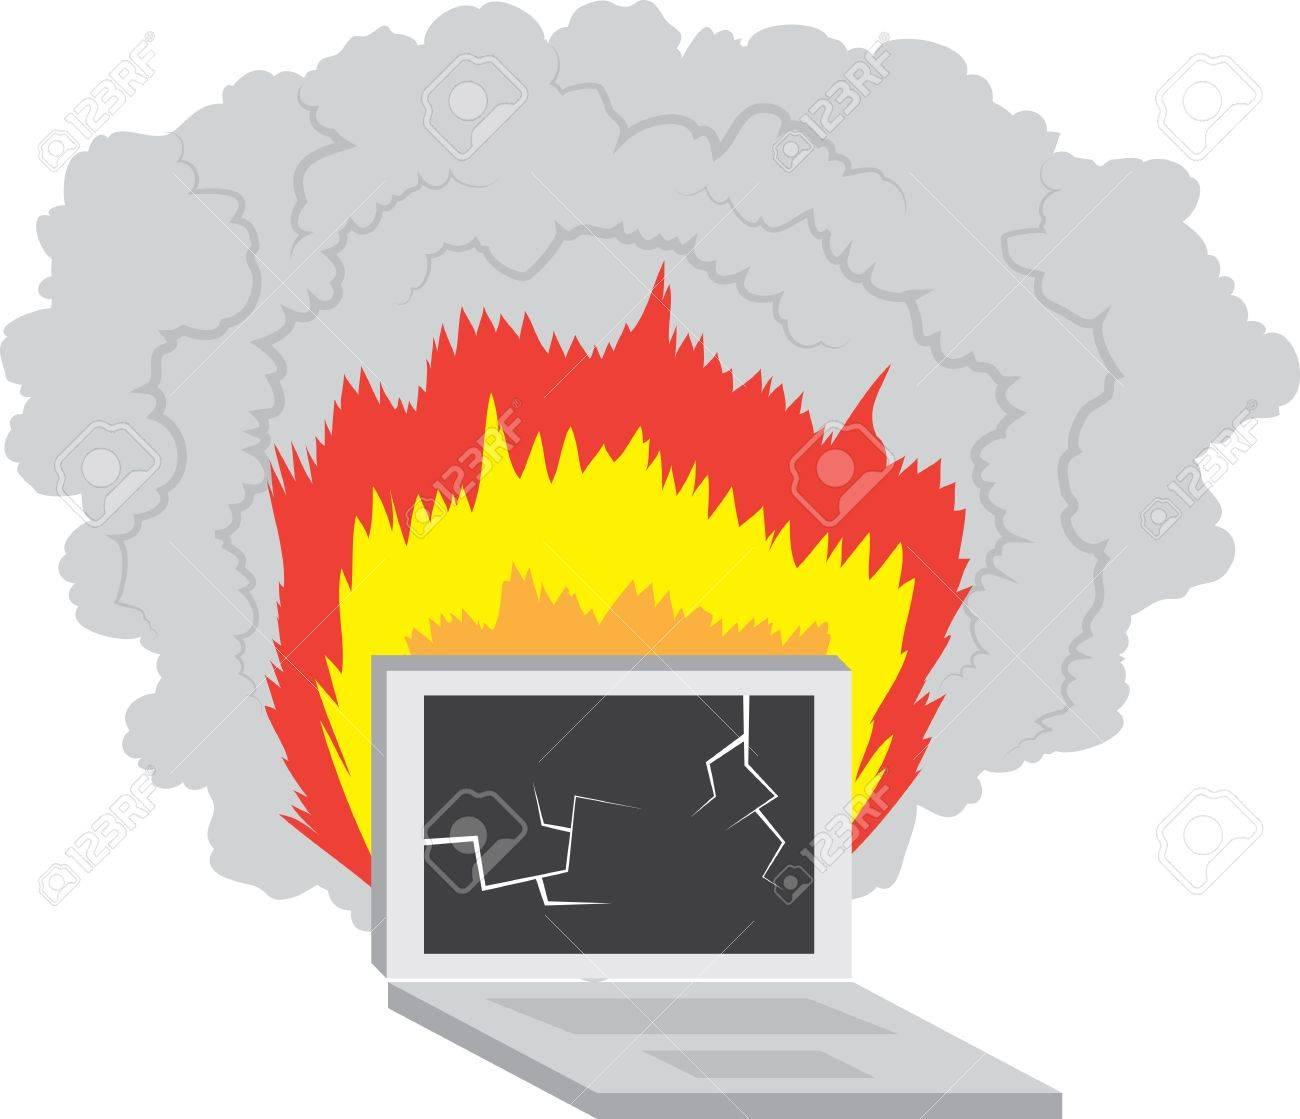 Laptop computer broken and on fire Stock Vector - 12472388